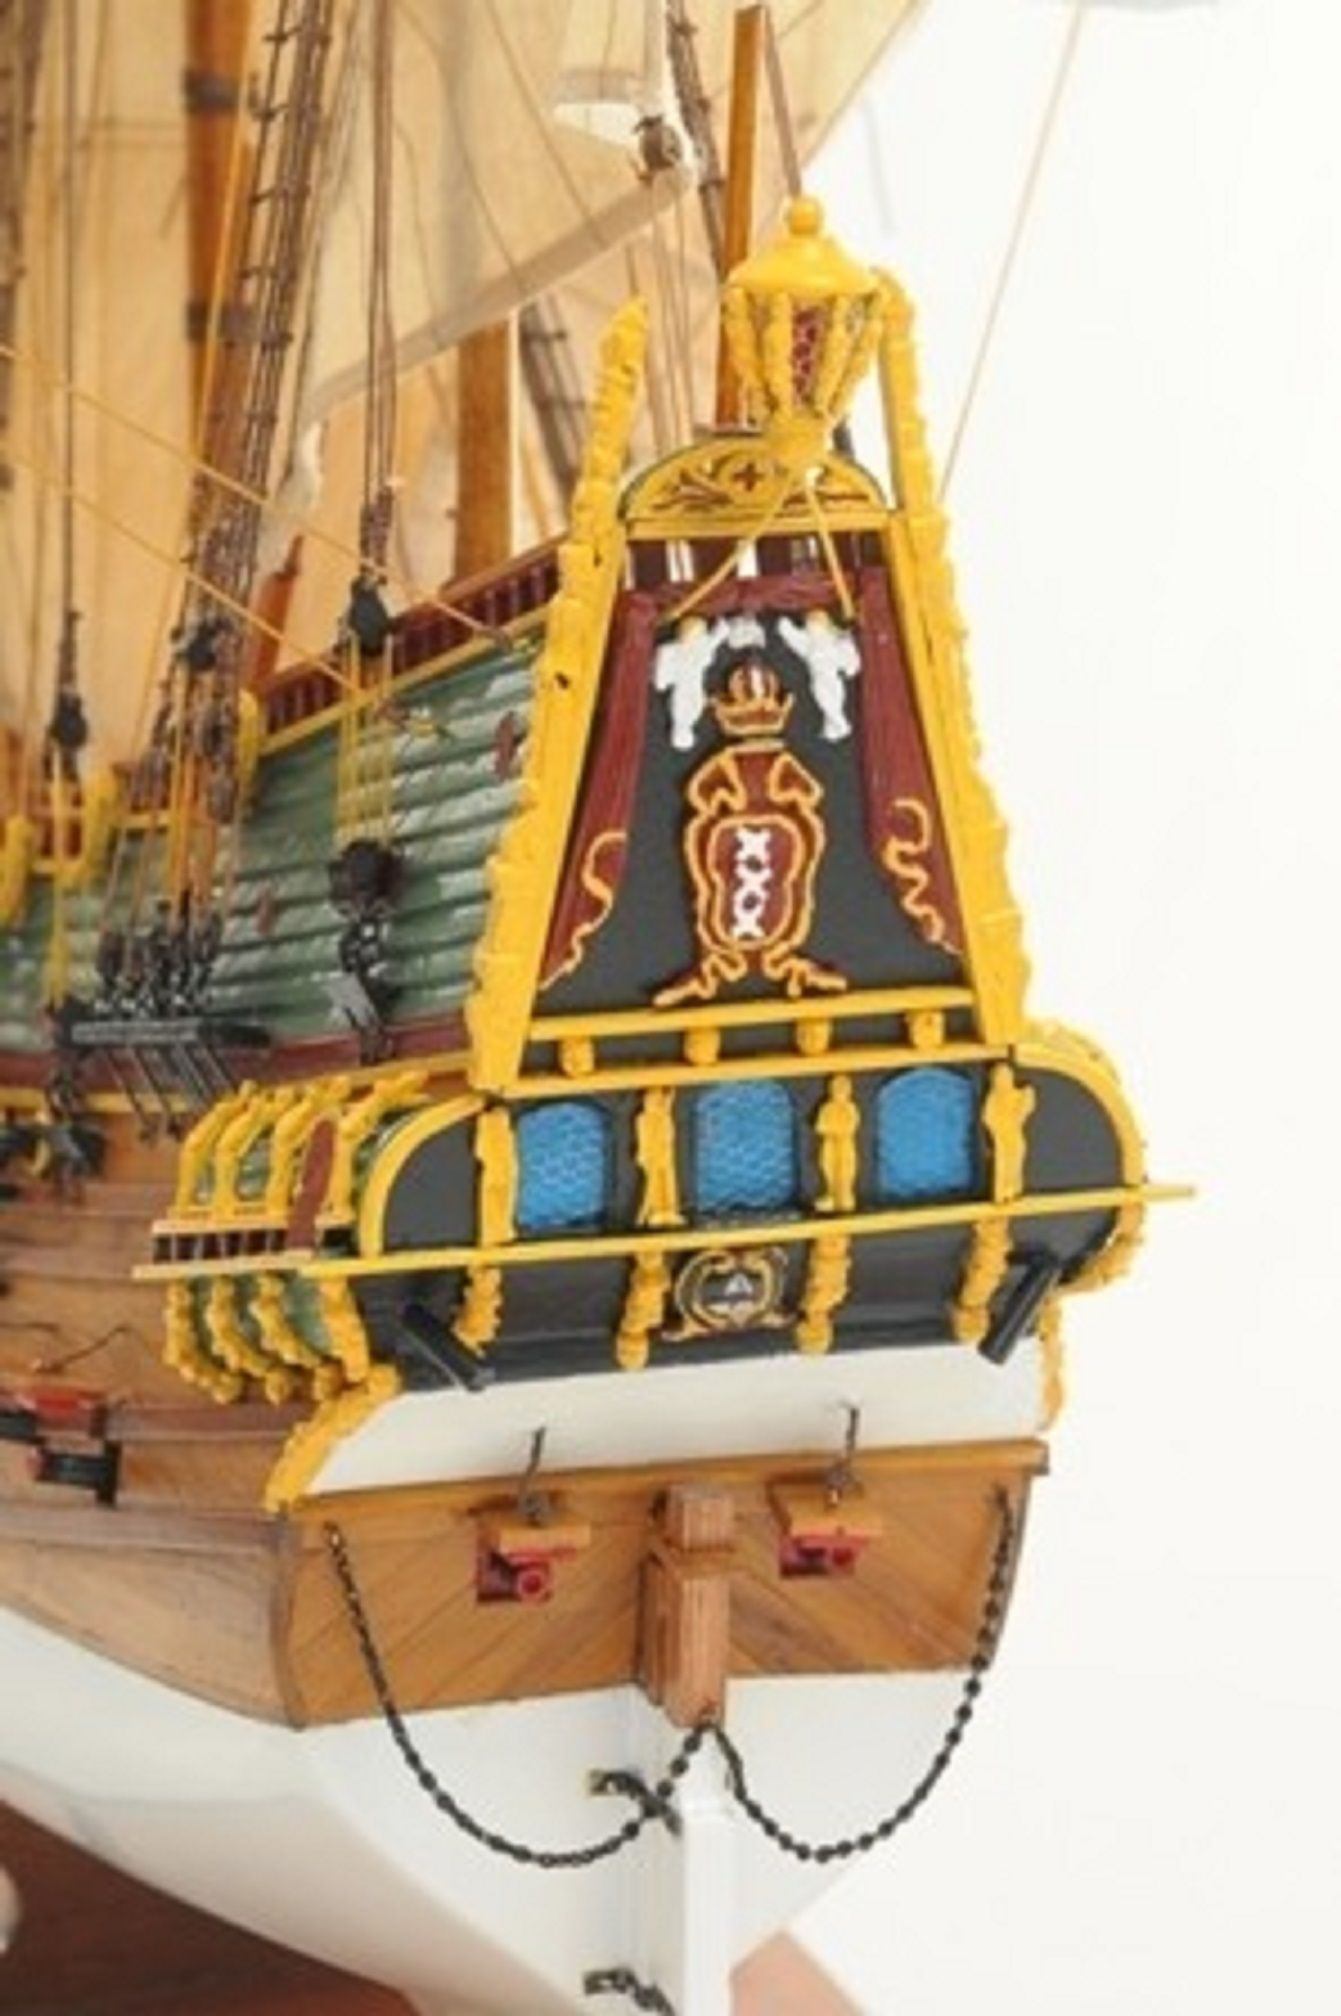 1057-7806-Batavia-model-ship-Superior-Range